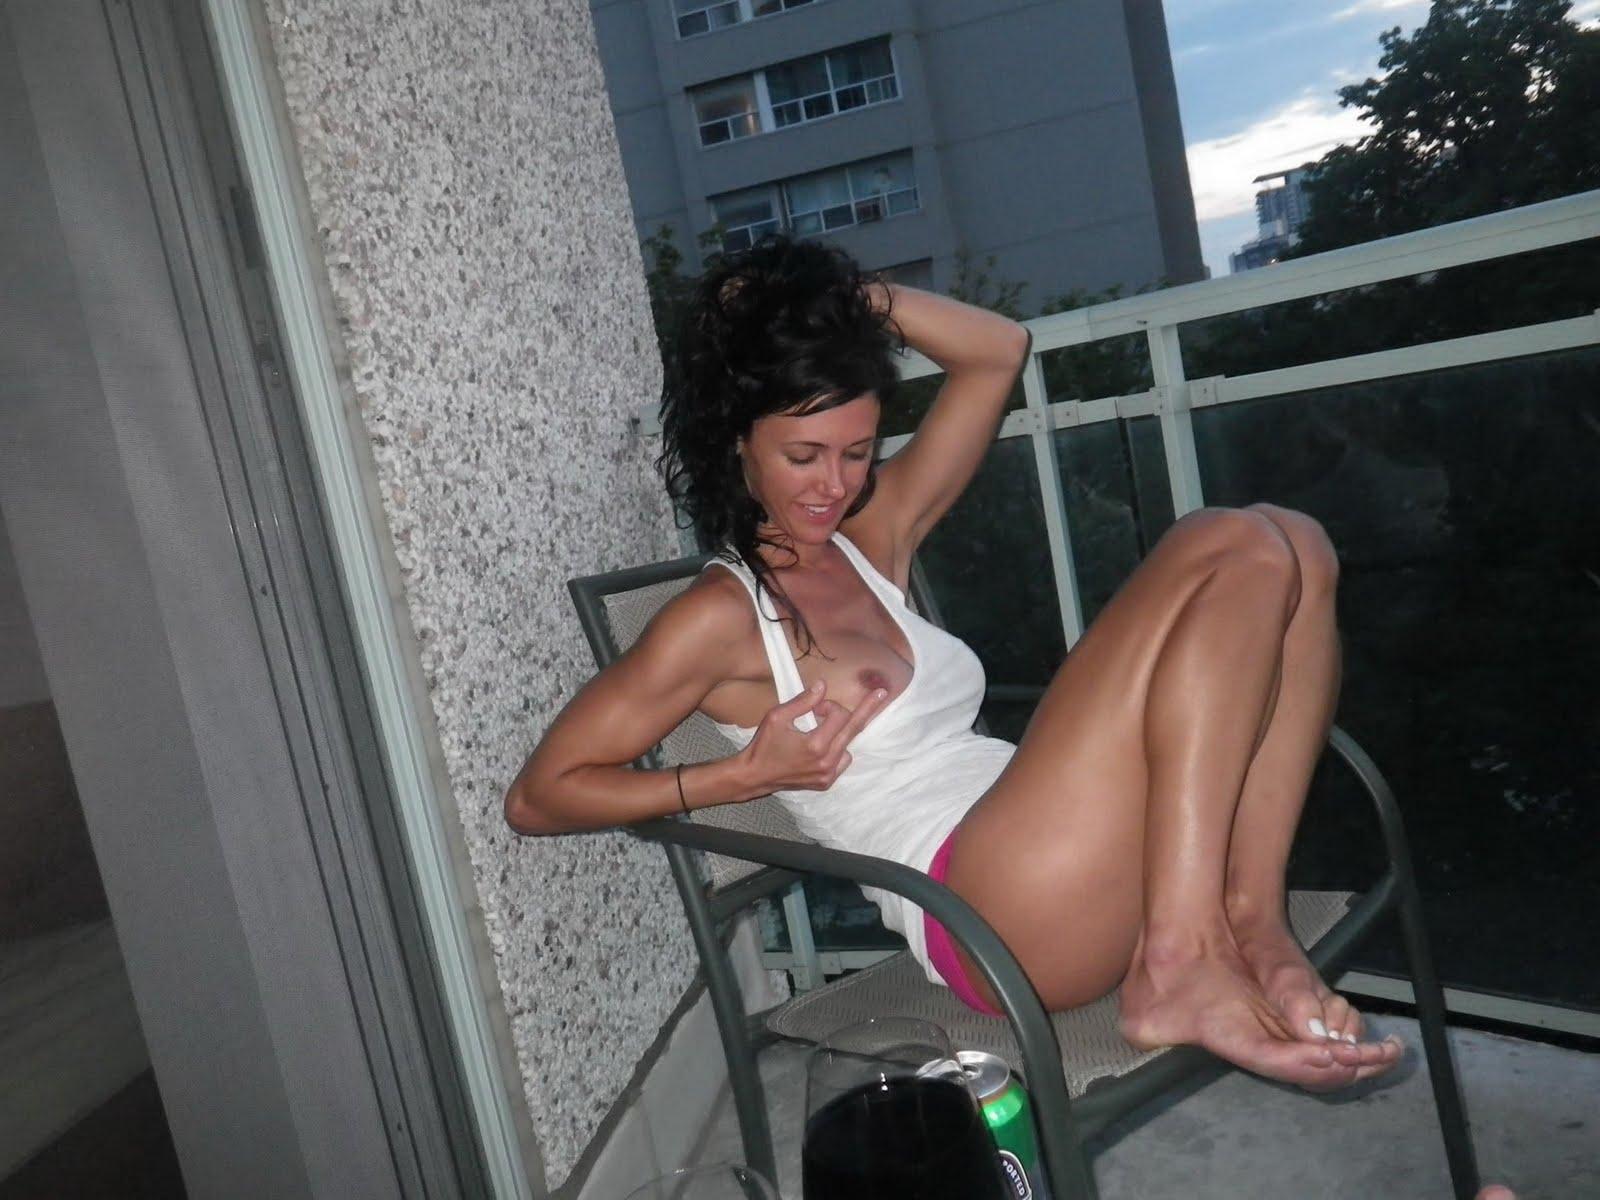 nude pics ass pics pussy pics   horny milf hot milf american